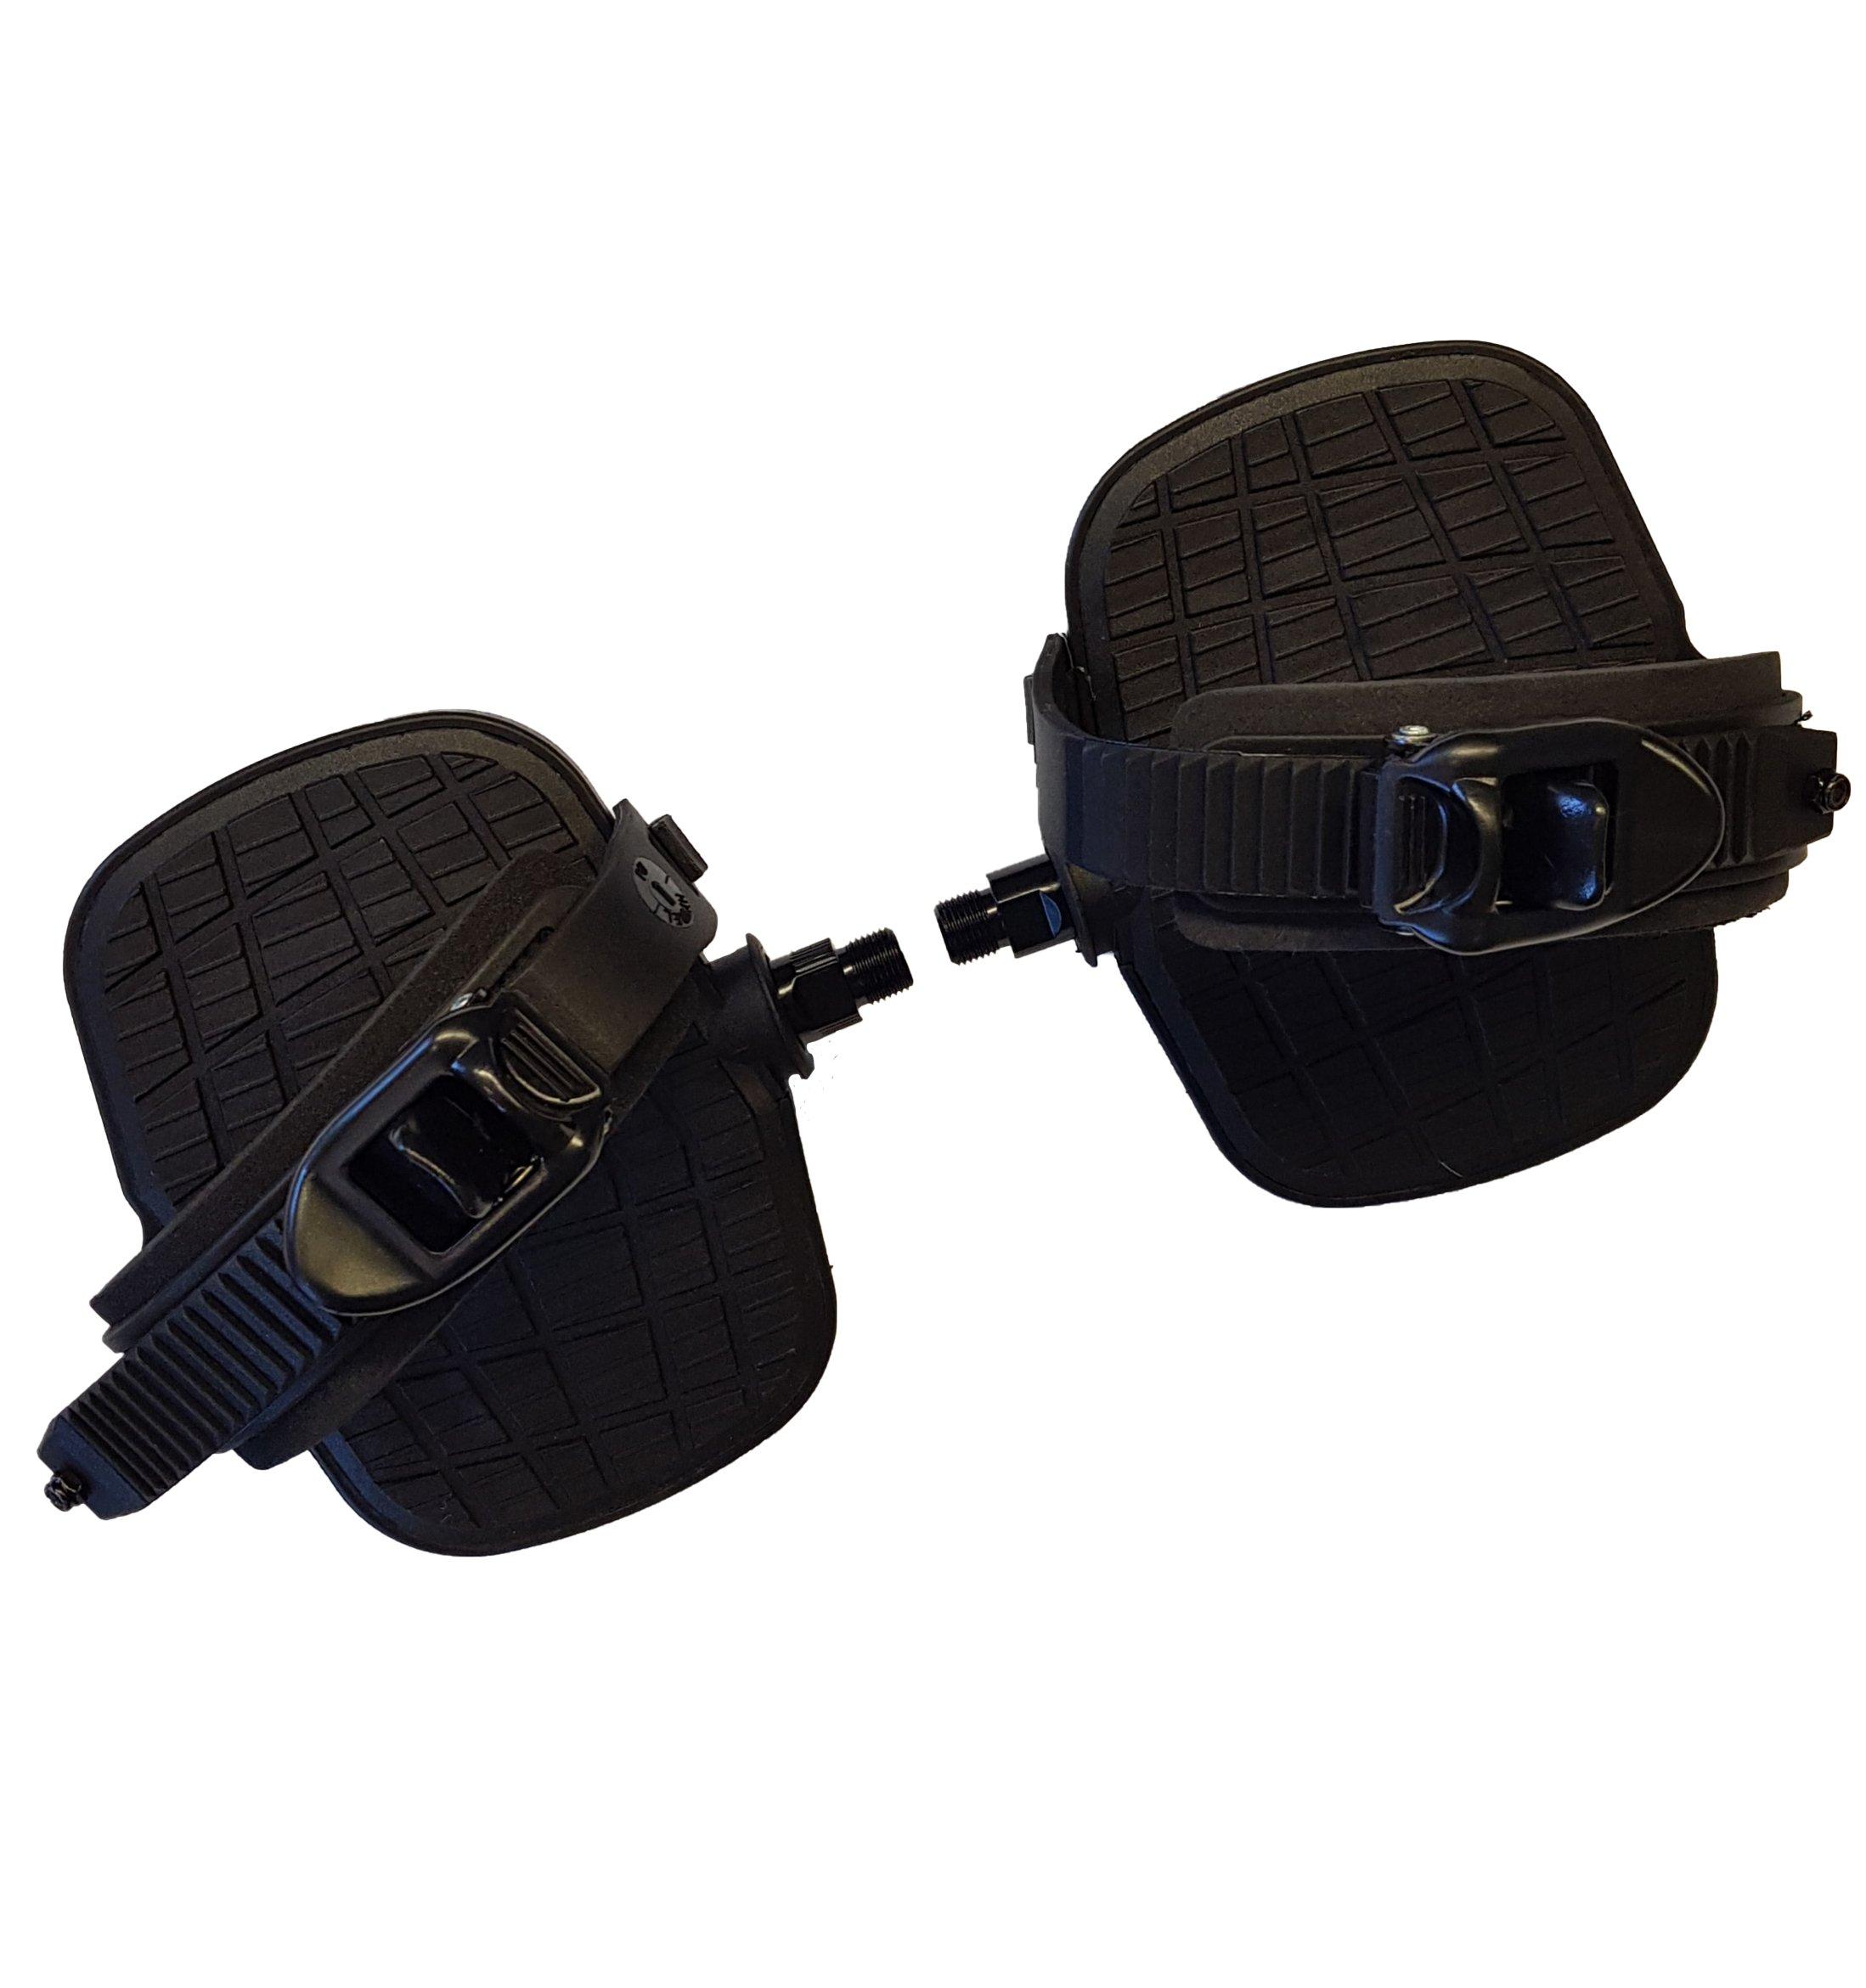 250G Liegefahrrad Pedal Paar (Grau)